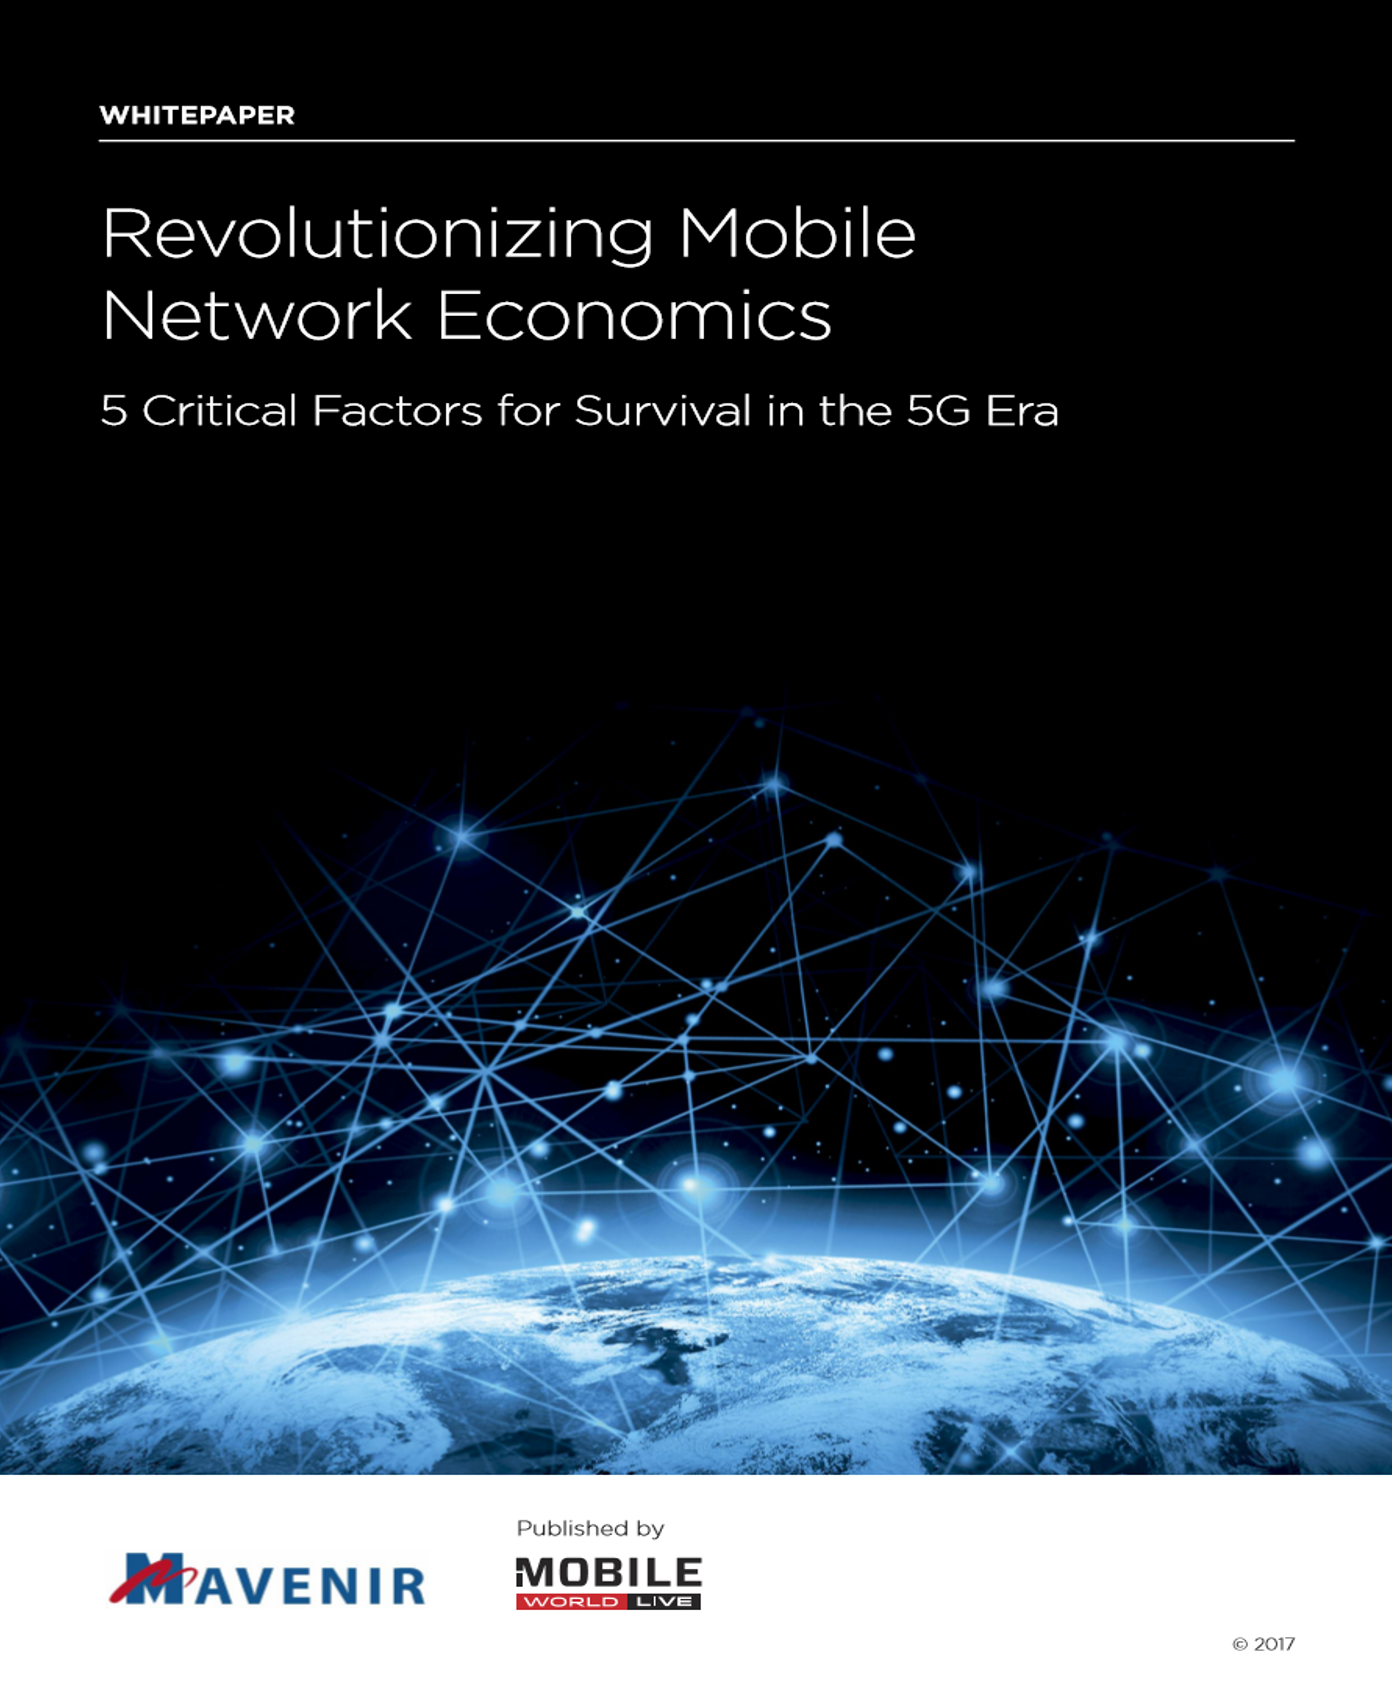 Revolutionizing Mobile Network Economics